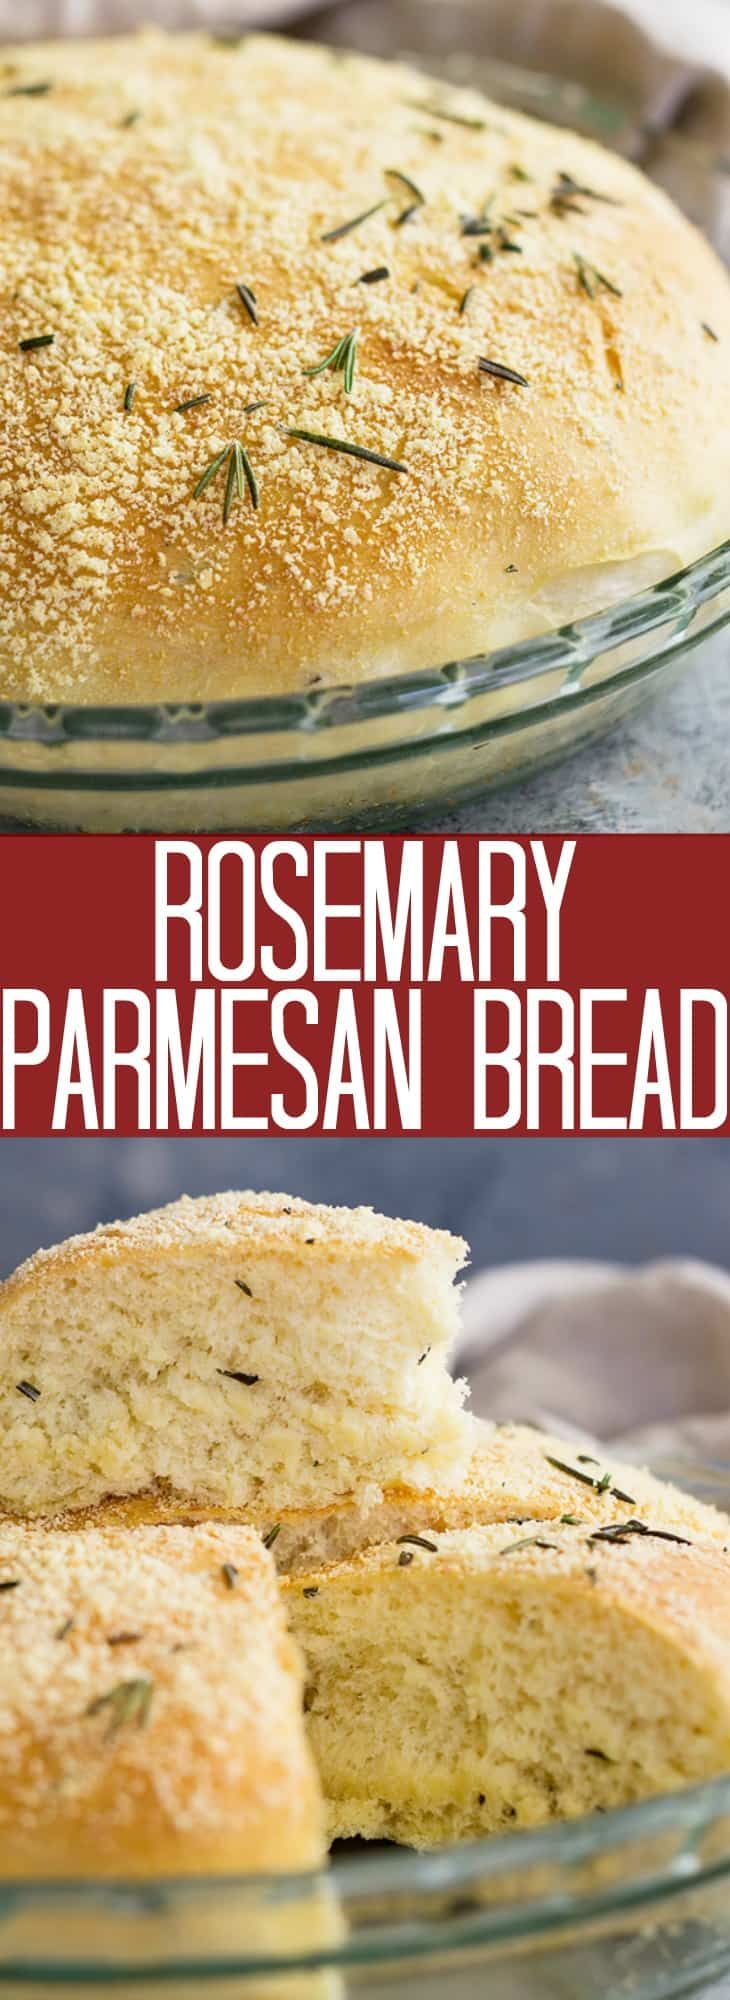 Rosemary Parmesan Bread | Countryside Cravings | Parmesan ...